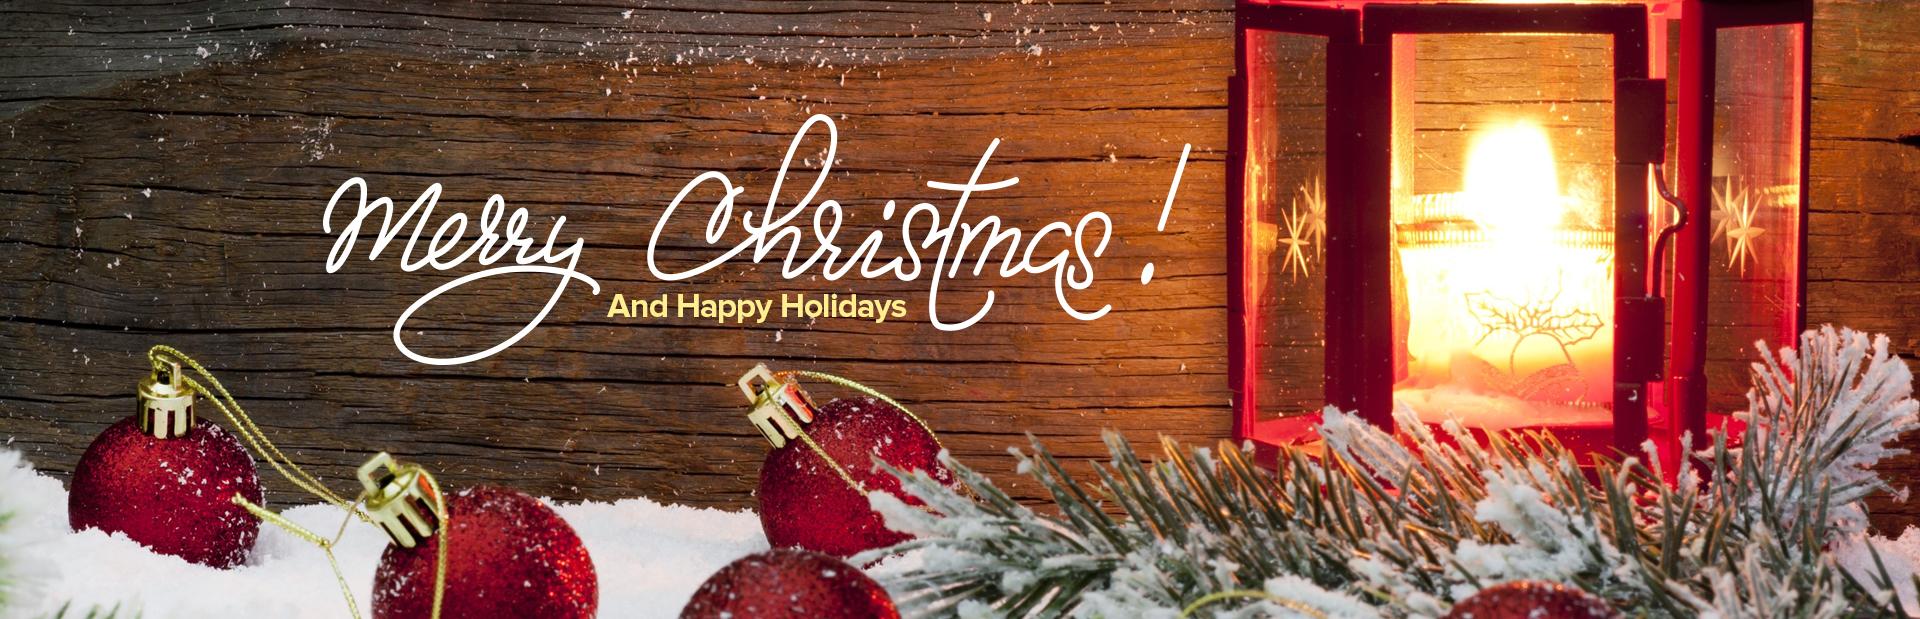 merry-christmas-brokshire-dentist